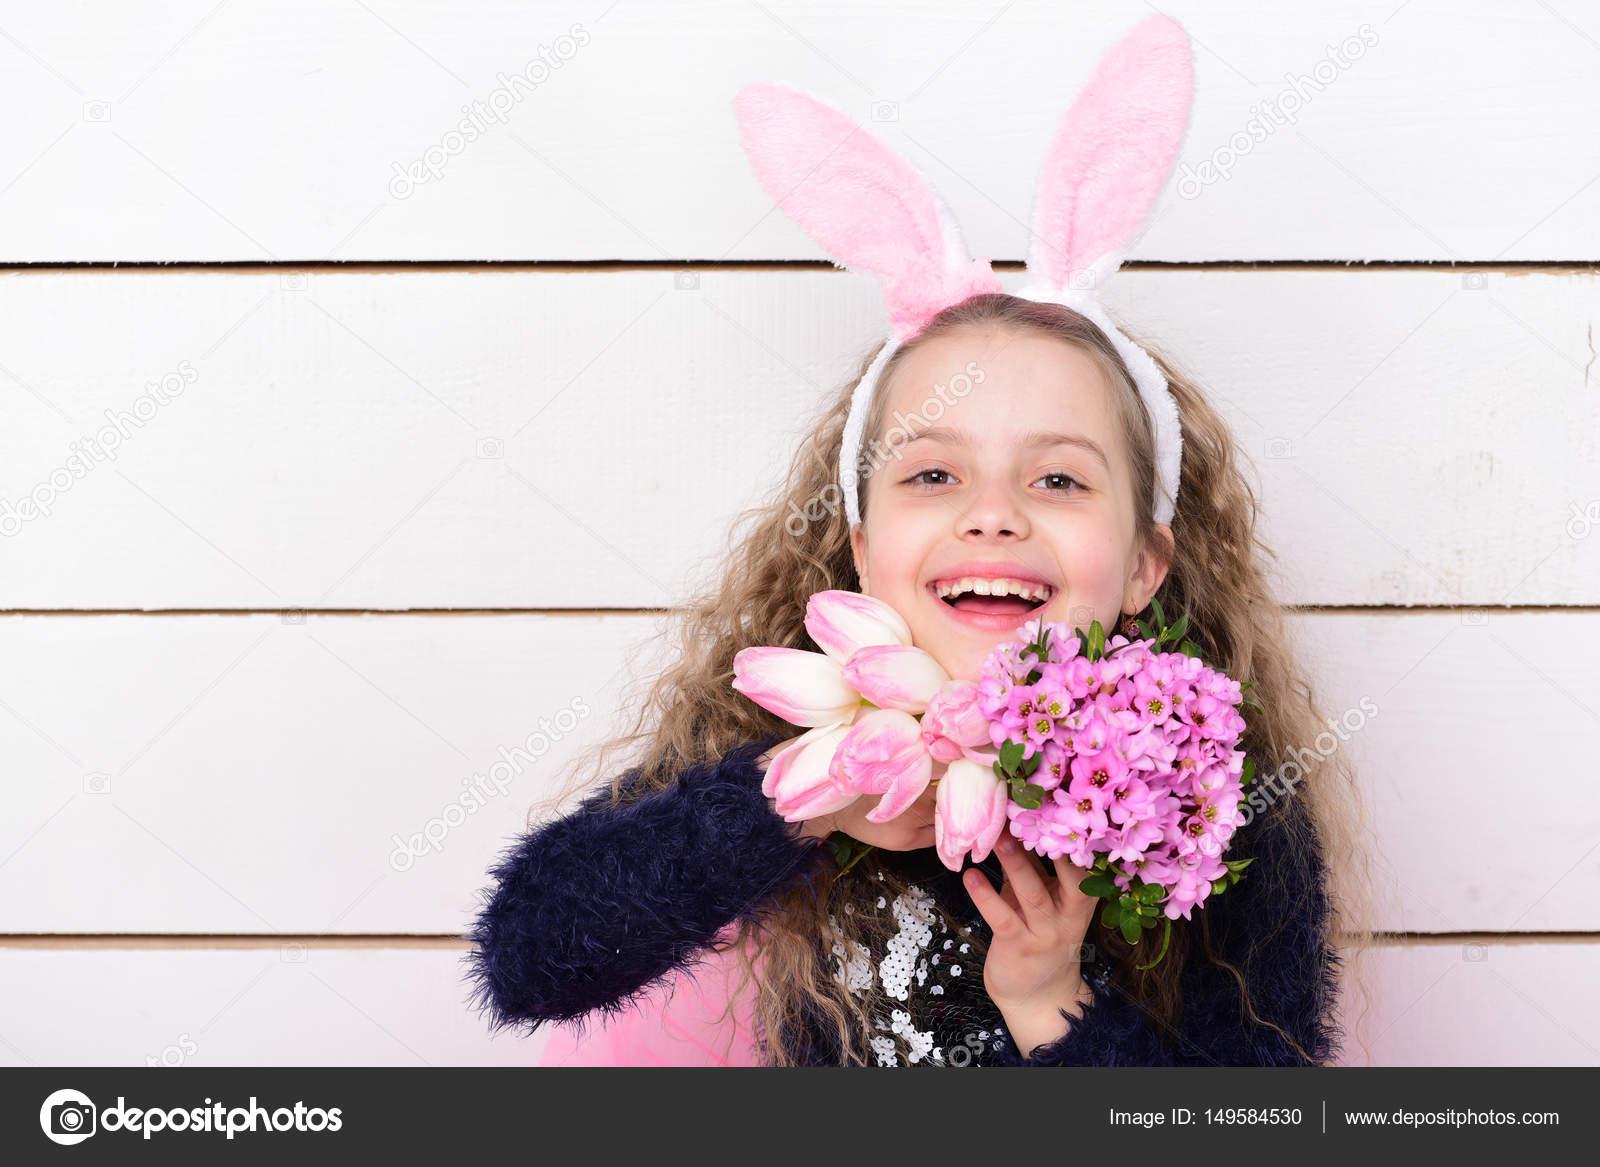 25def5b7c4b Ευτυχισμένος κορίτσι στο Πάσχα λαγουδάκι αυτιά με λουλούδι ροζ τουλίπα — Φωτογραφία  Αρχείου